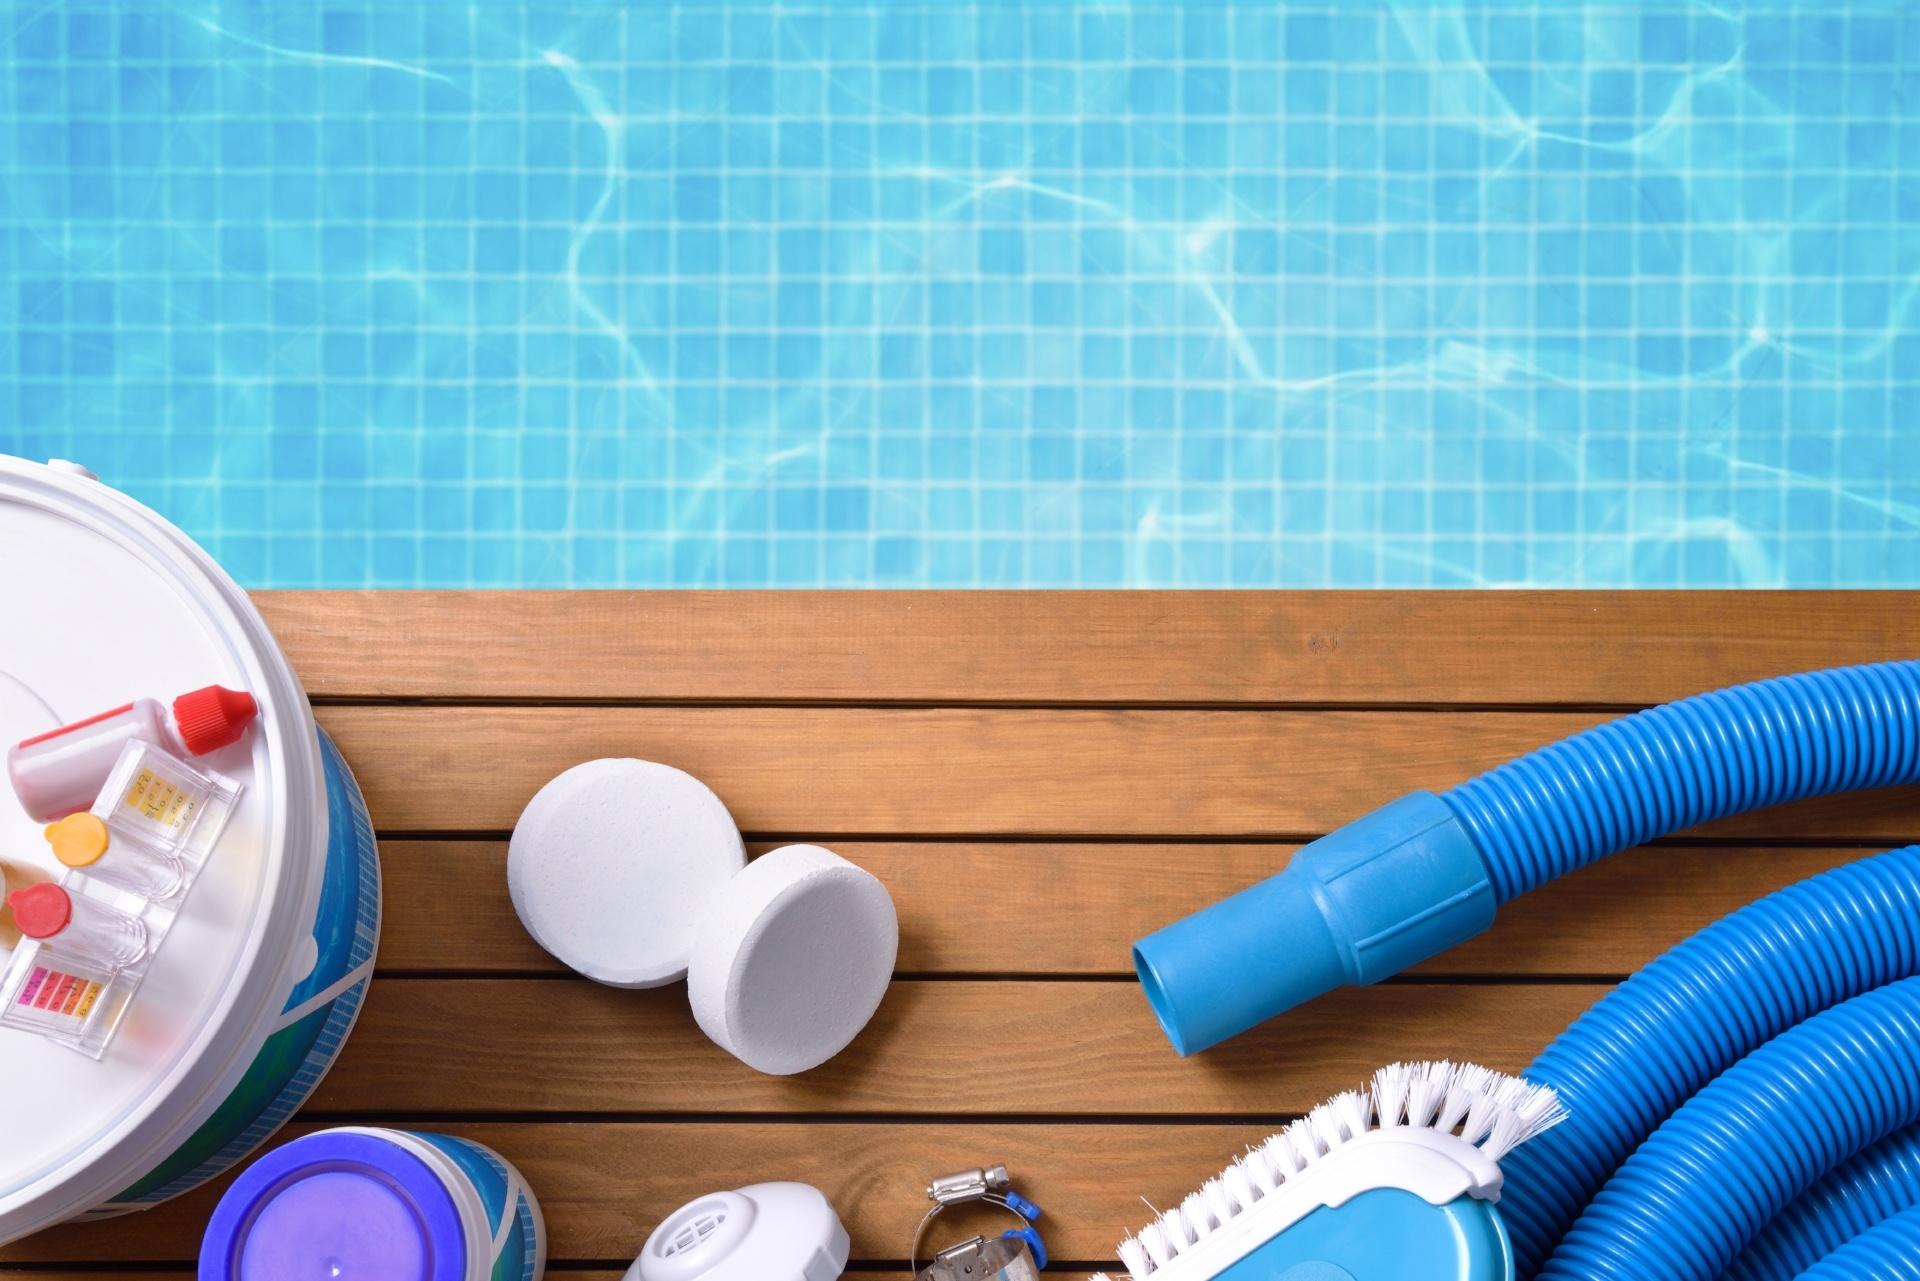 Pool Products-257669-edited.jpg